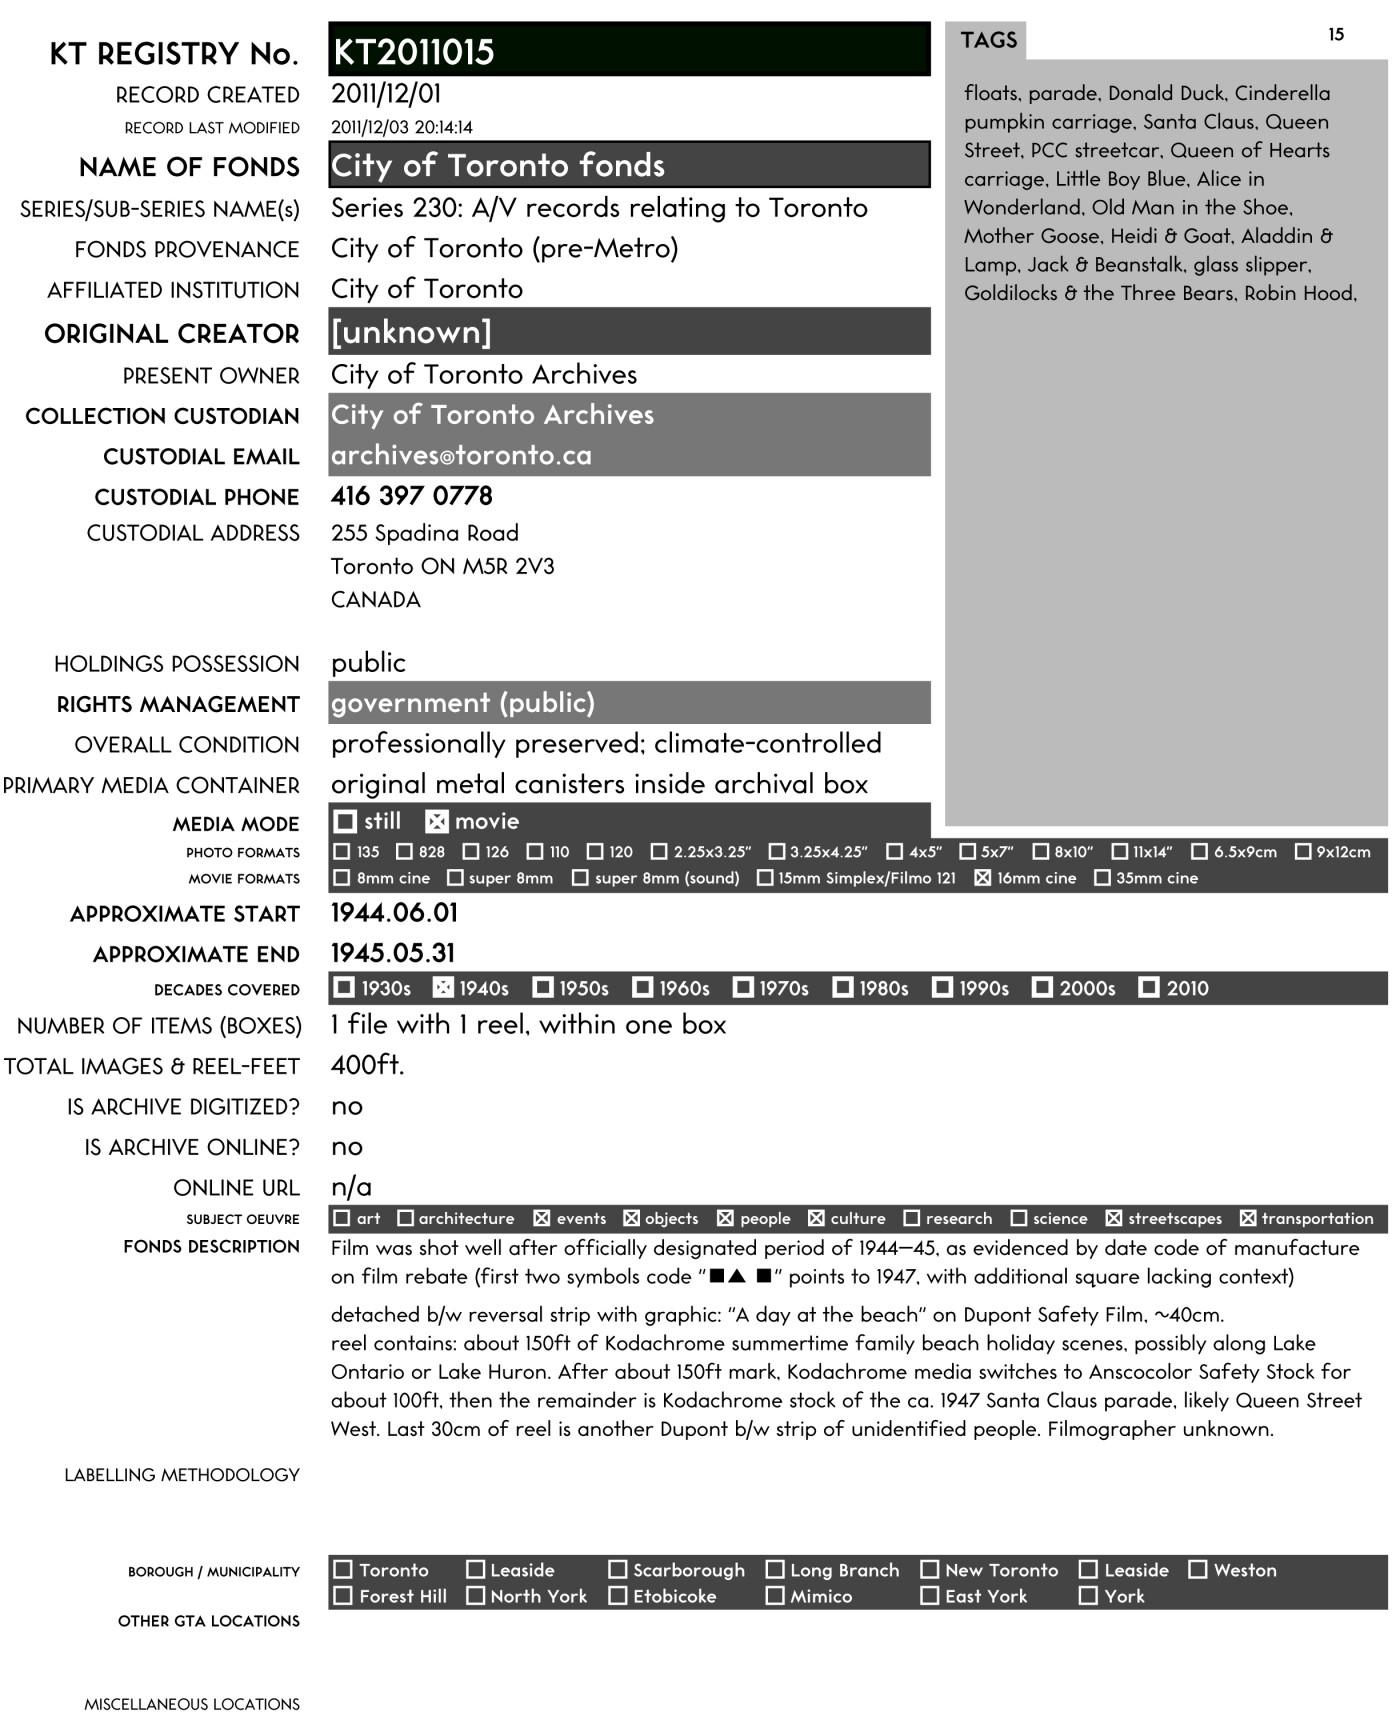 Appendix B. Sample Registry record, accession KT2011015. [Kodachrome Toronto Registry]